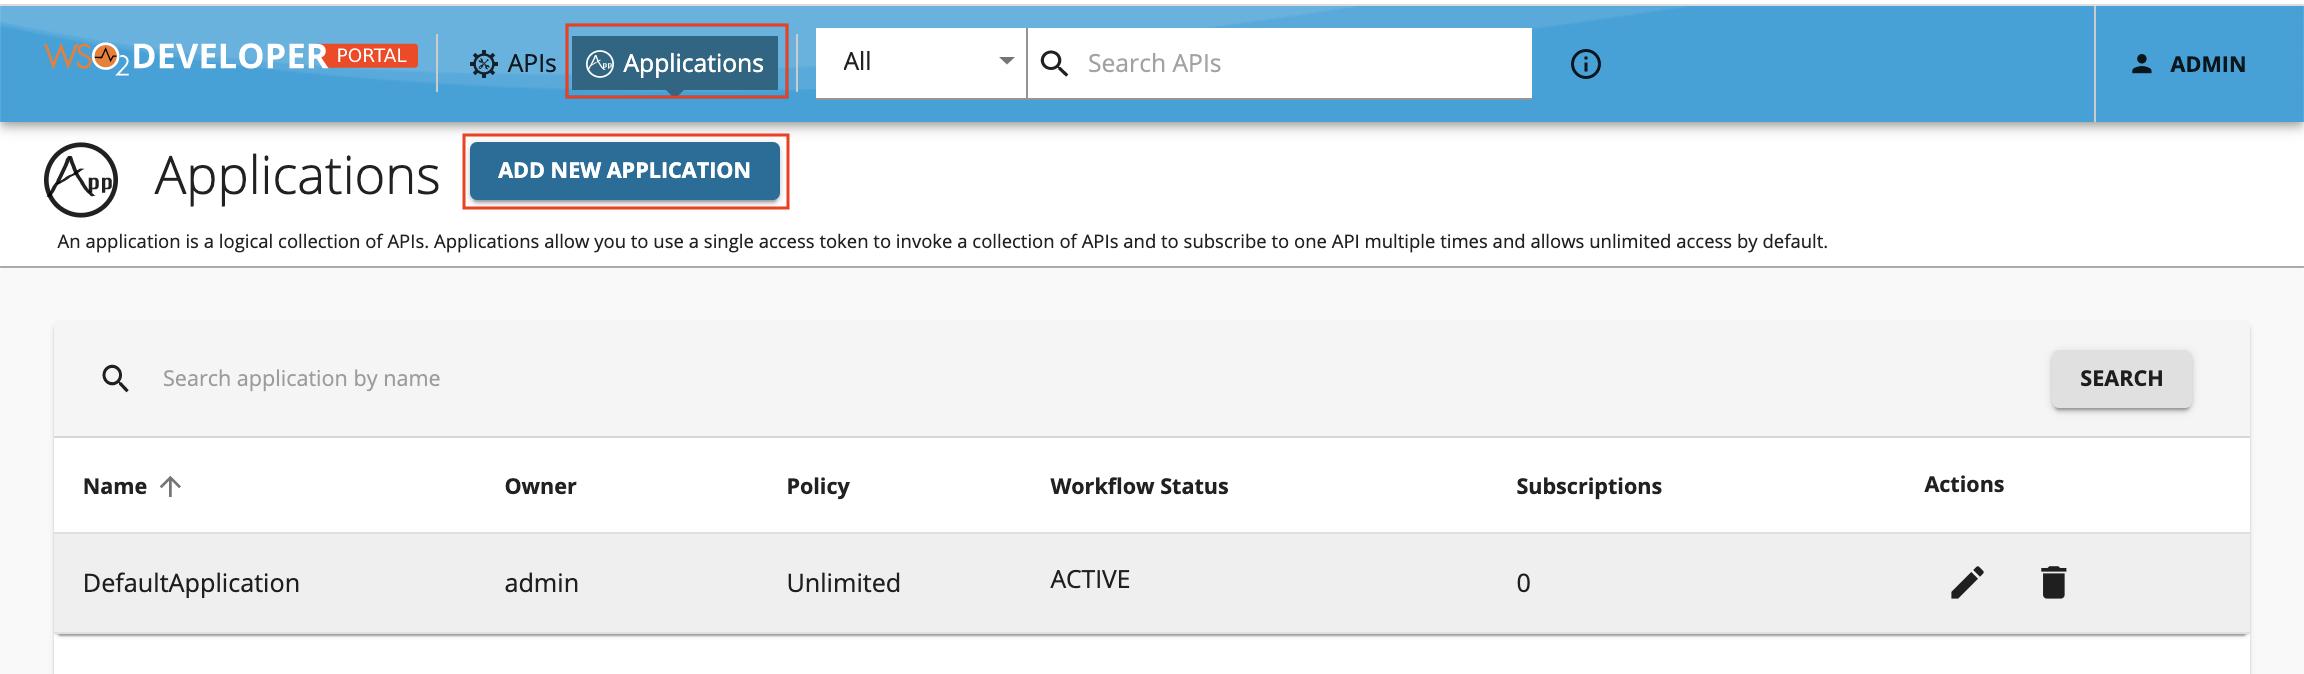 Add new application option